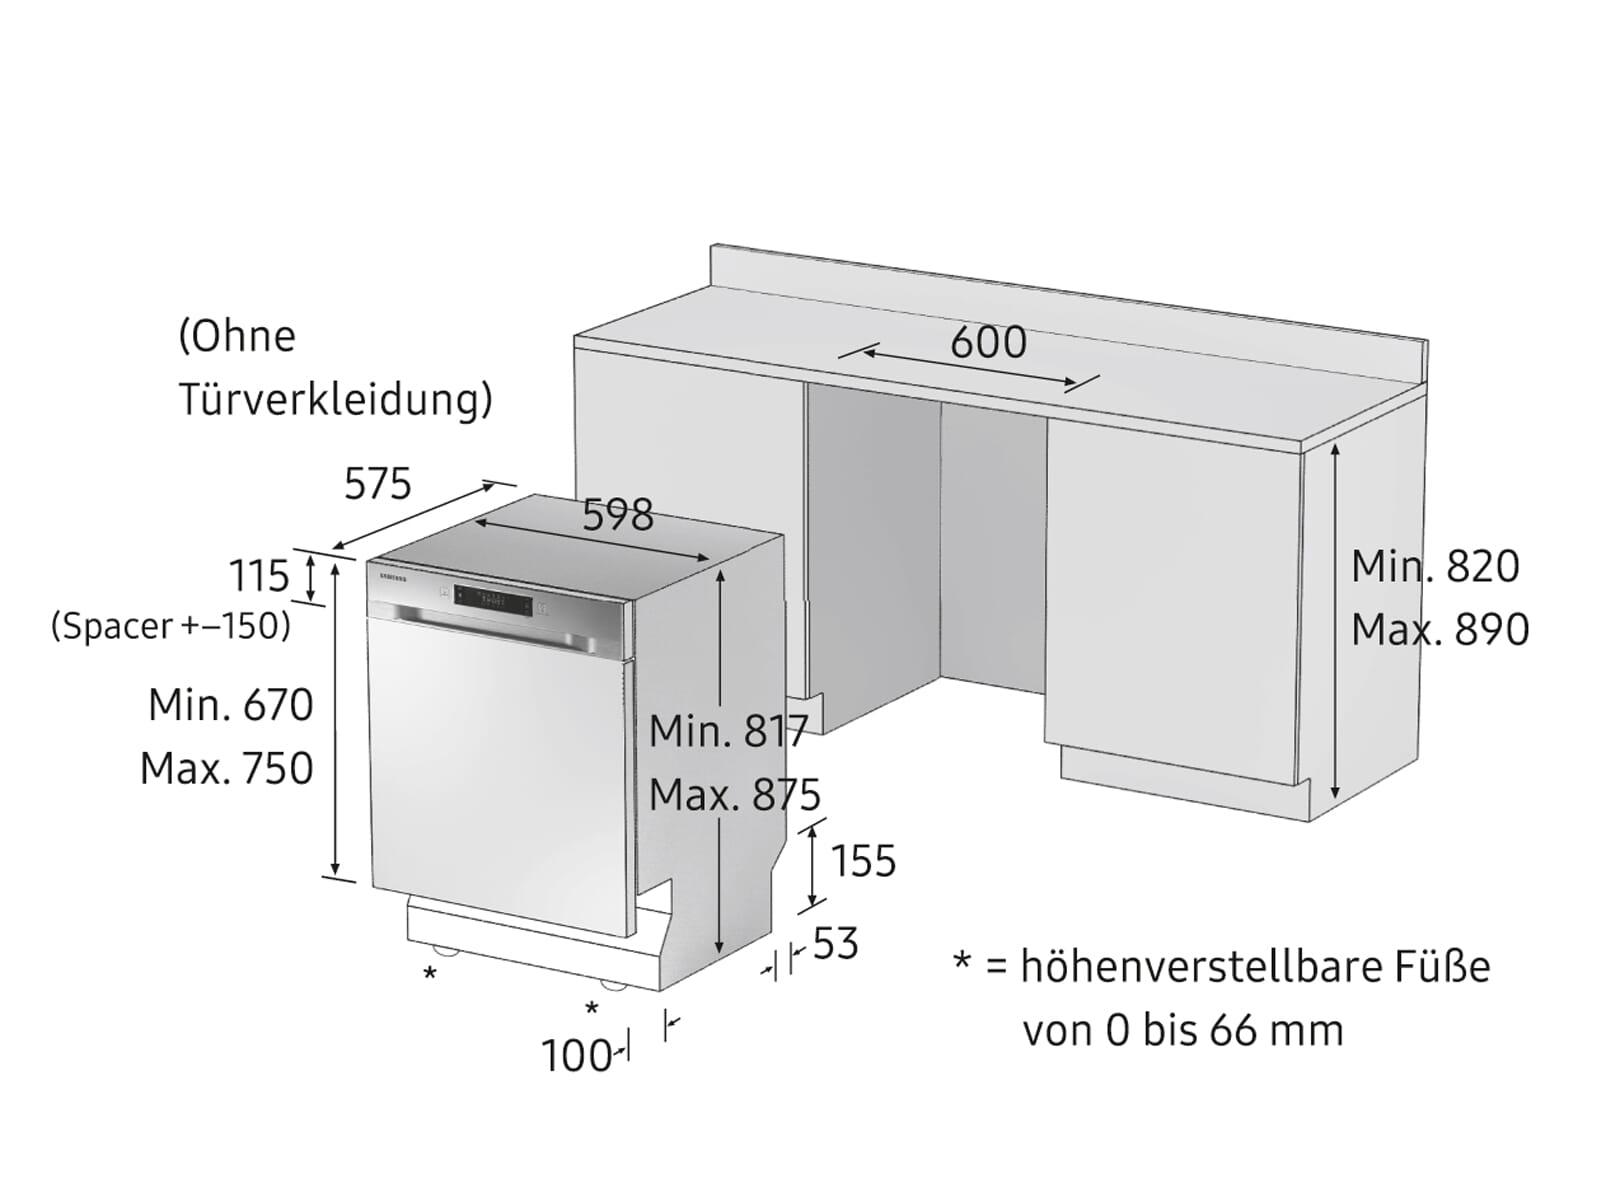 Samsung DW60M6031BB/EG Vollintegrierbarer Einbaugeschirrspüler